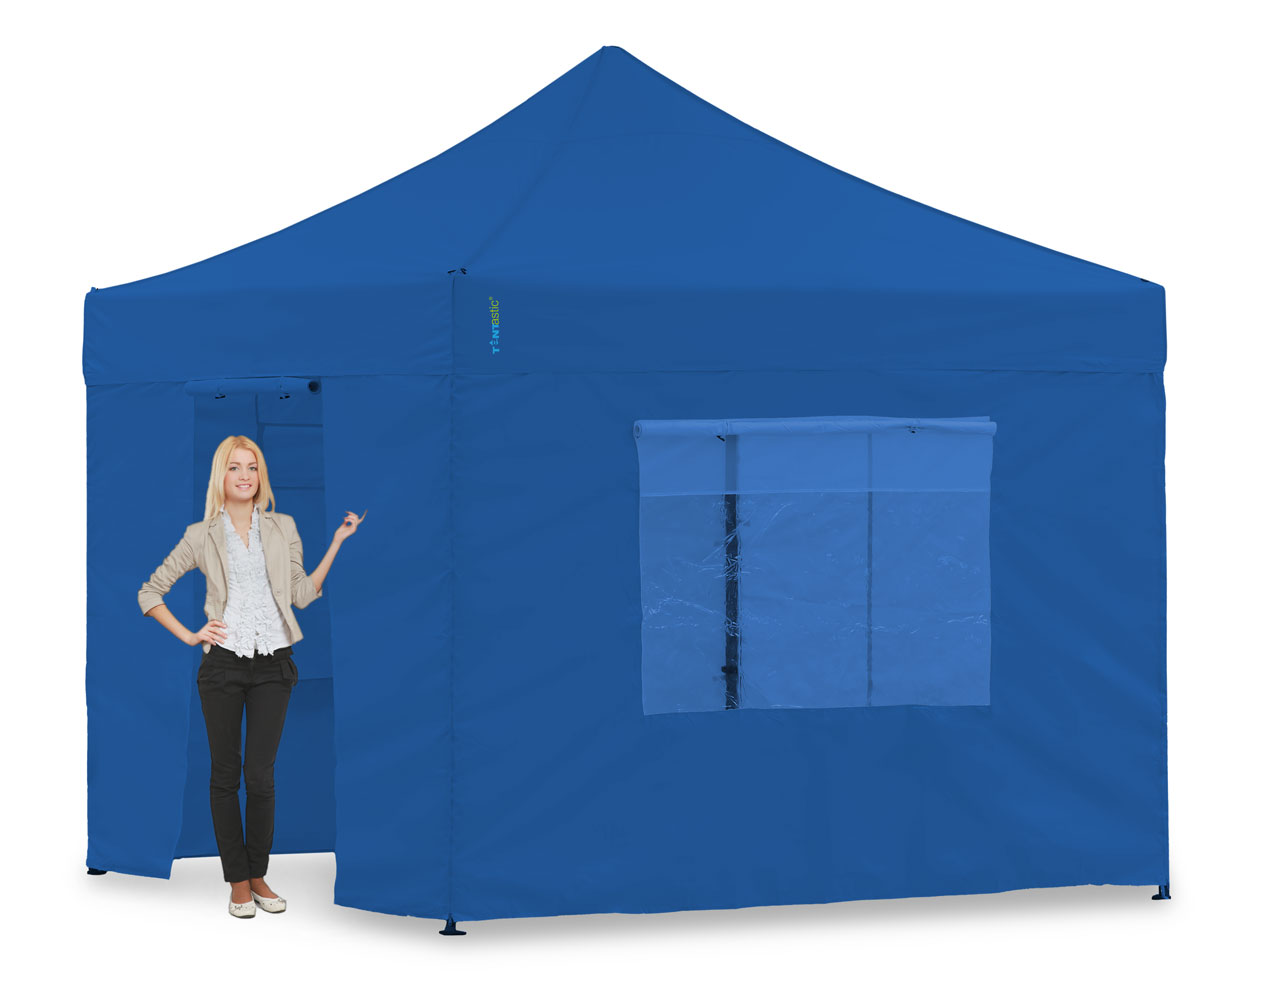 versandkostenfrei wasserdichtes faltzelt 3x3 blau tentastic light pavillon komplett set blau. Black Bedroom Furniture Sets. Home Design Ideas